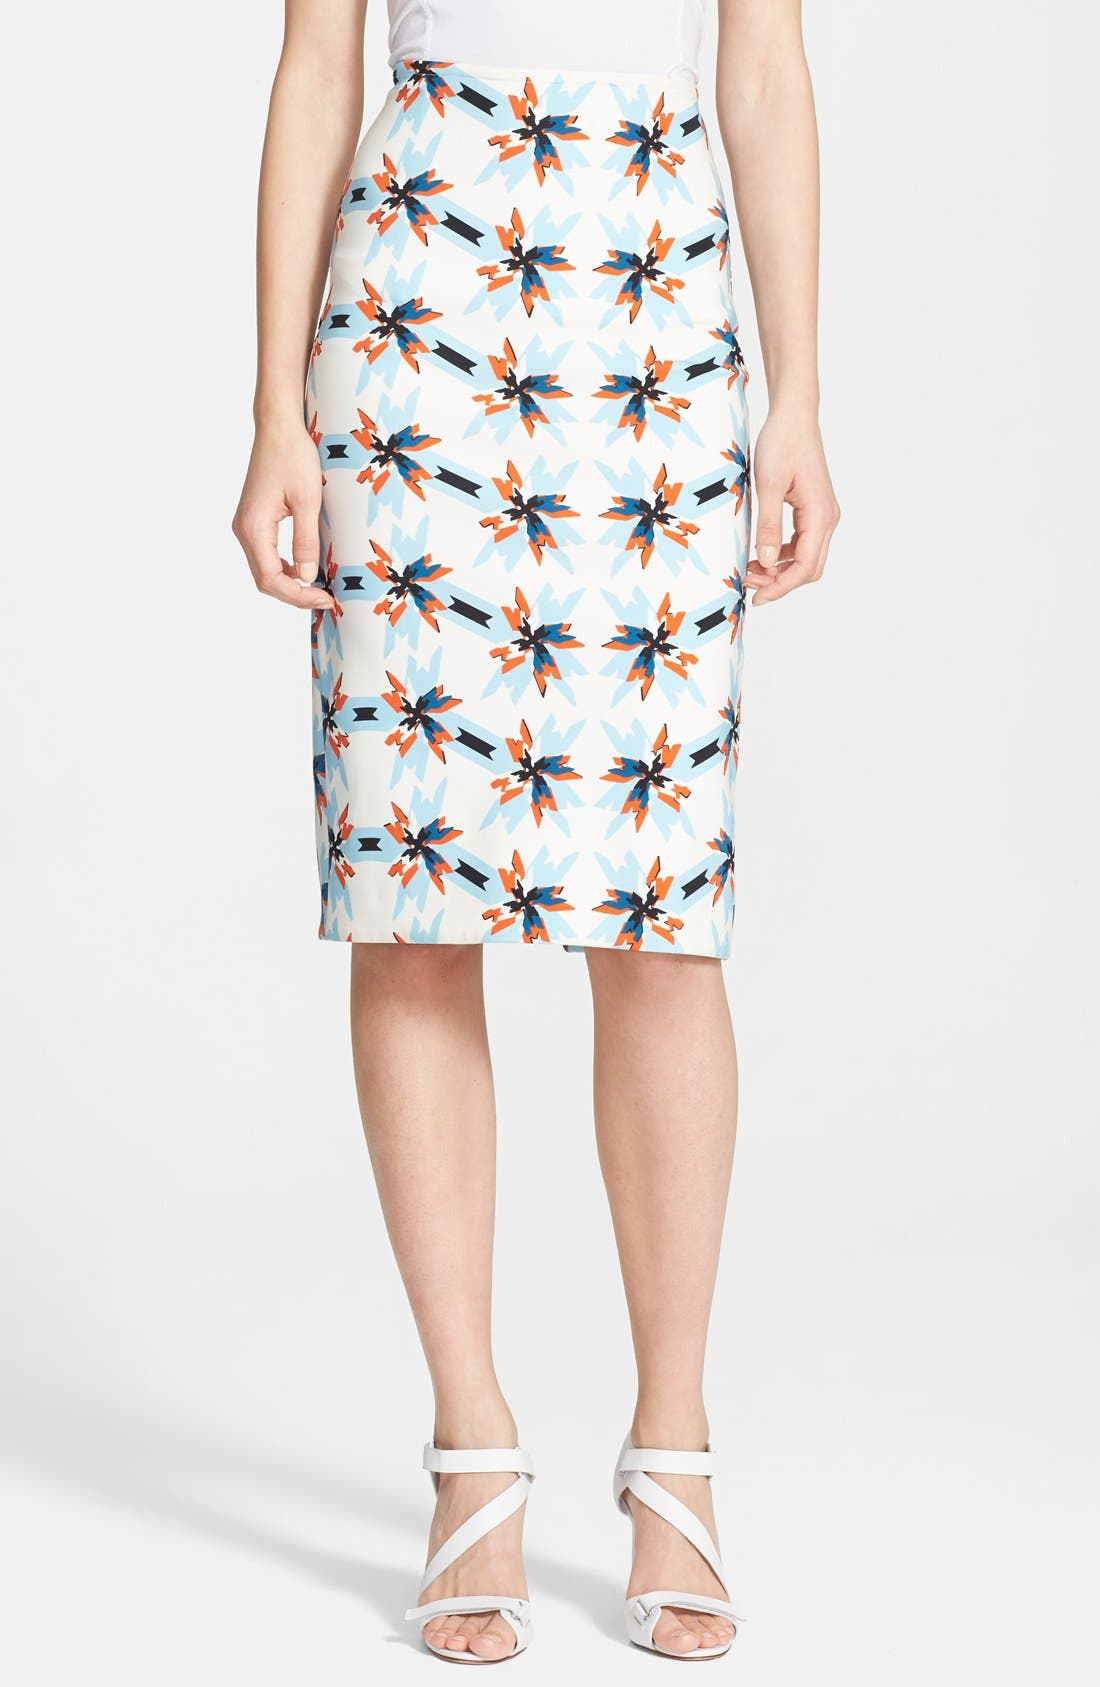 TANYA TAYLOR 'Bundy' Print Pencil Skirt, Main, color, 400